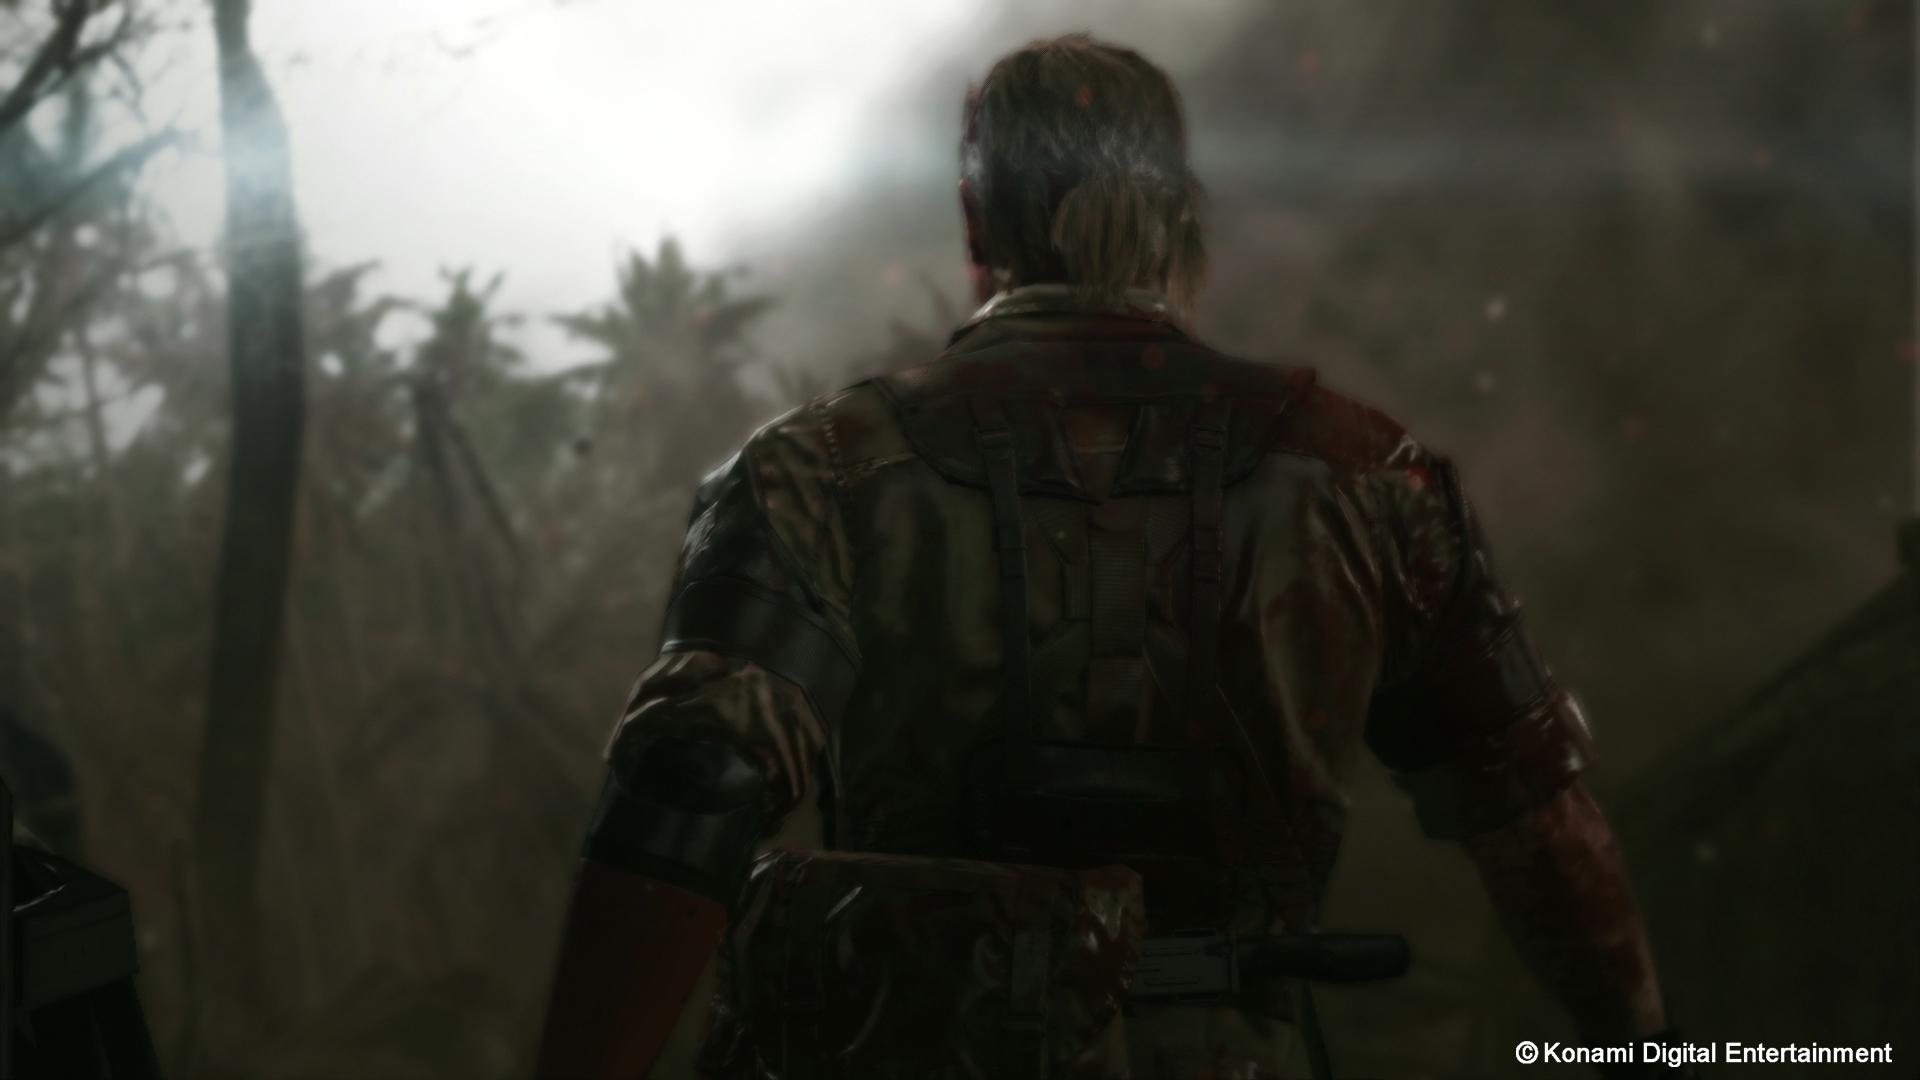 Metal-Gear-Solid-Phantom-Pain-ScreenShot-_-Gallery-UbiRock.iR-16